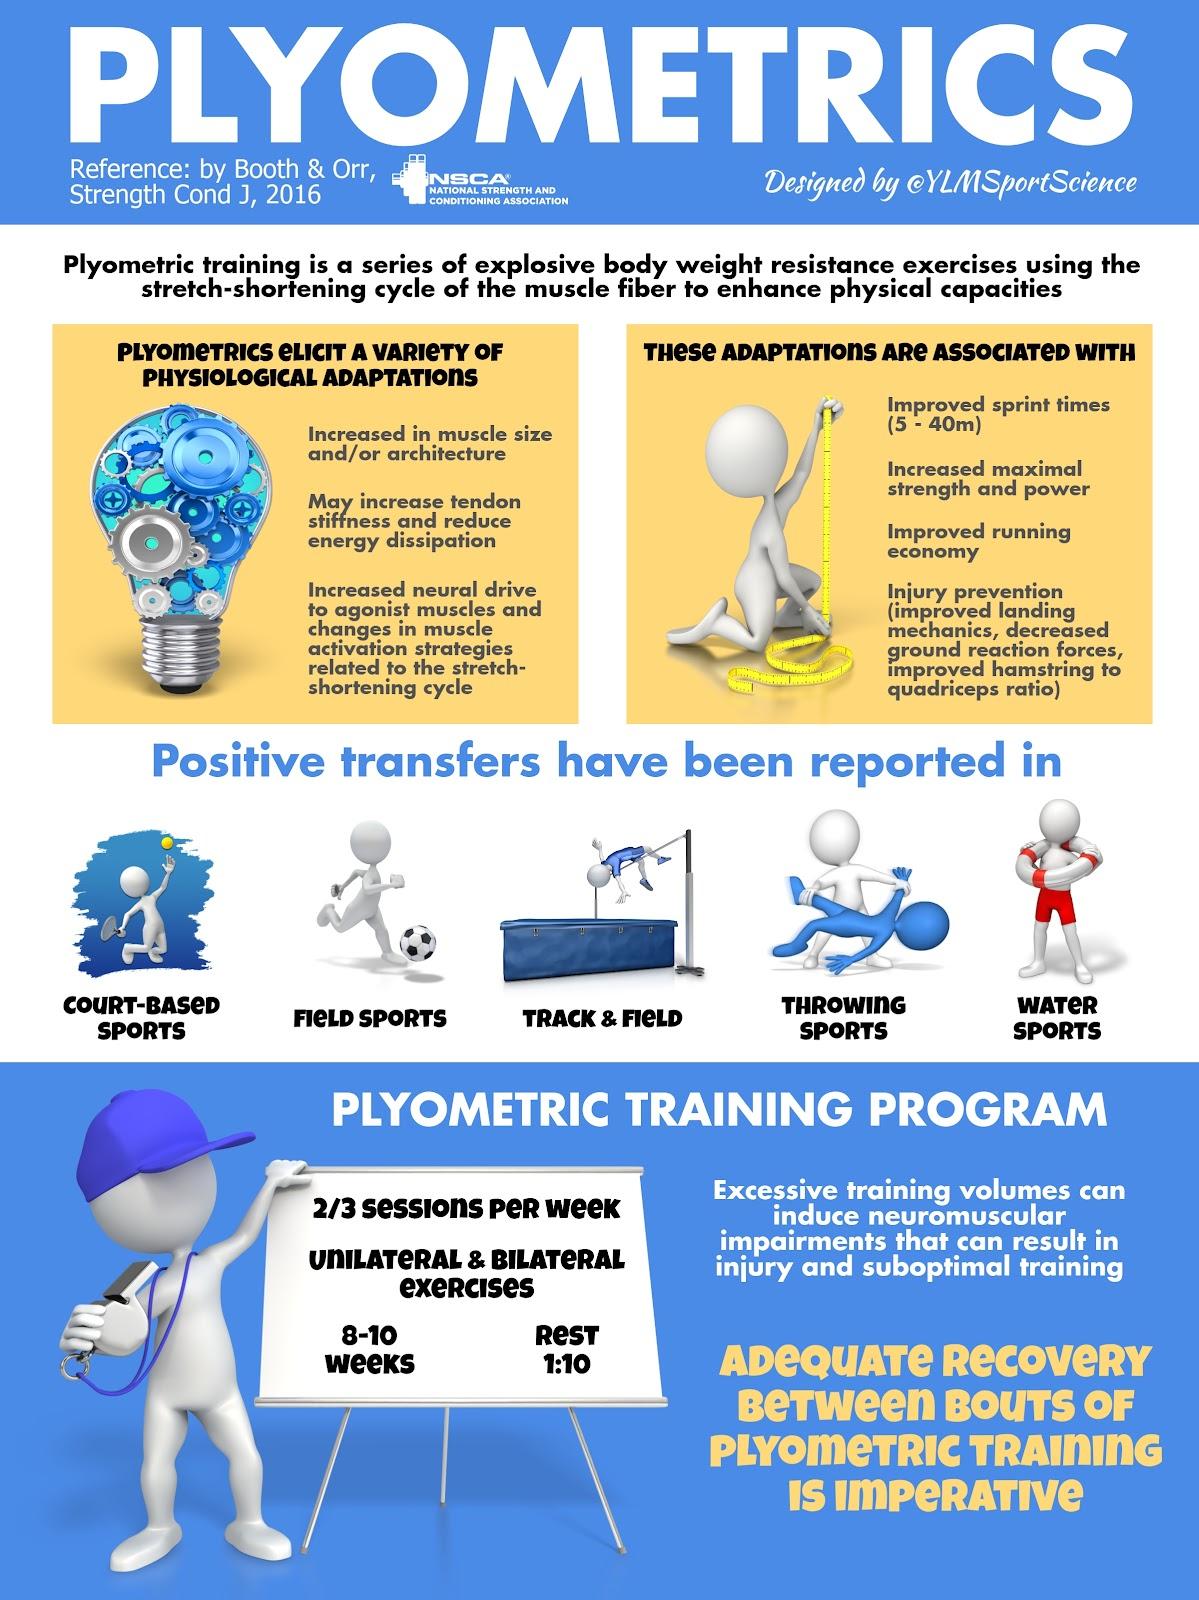 Plyometric training